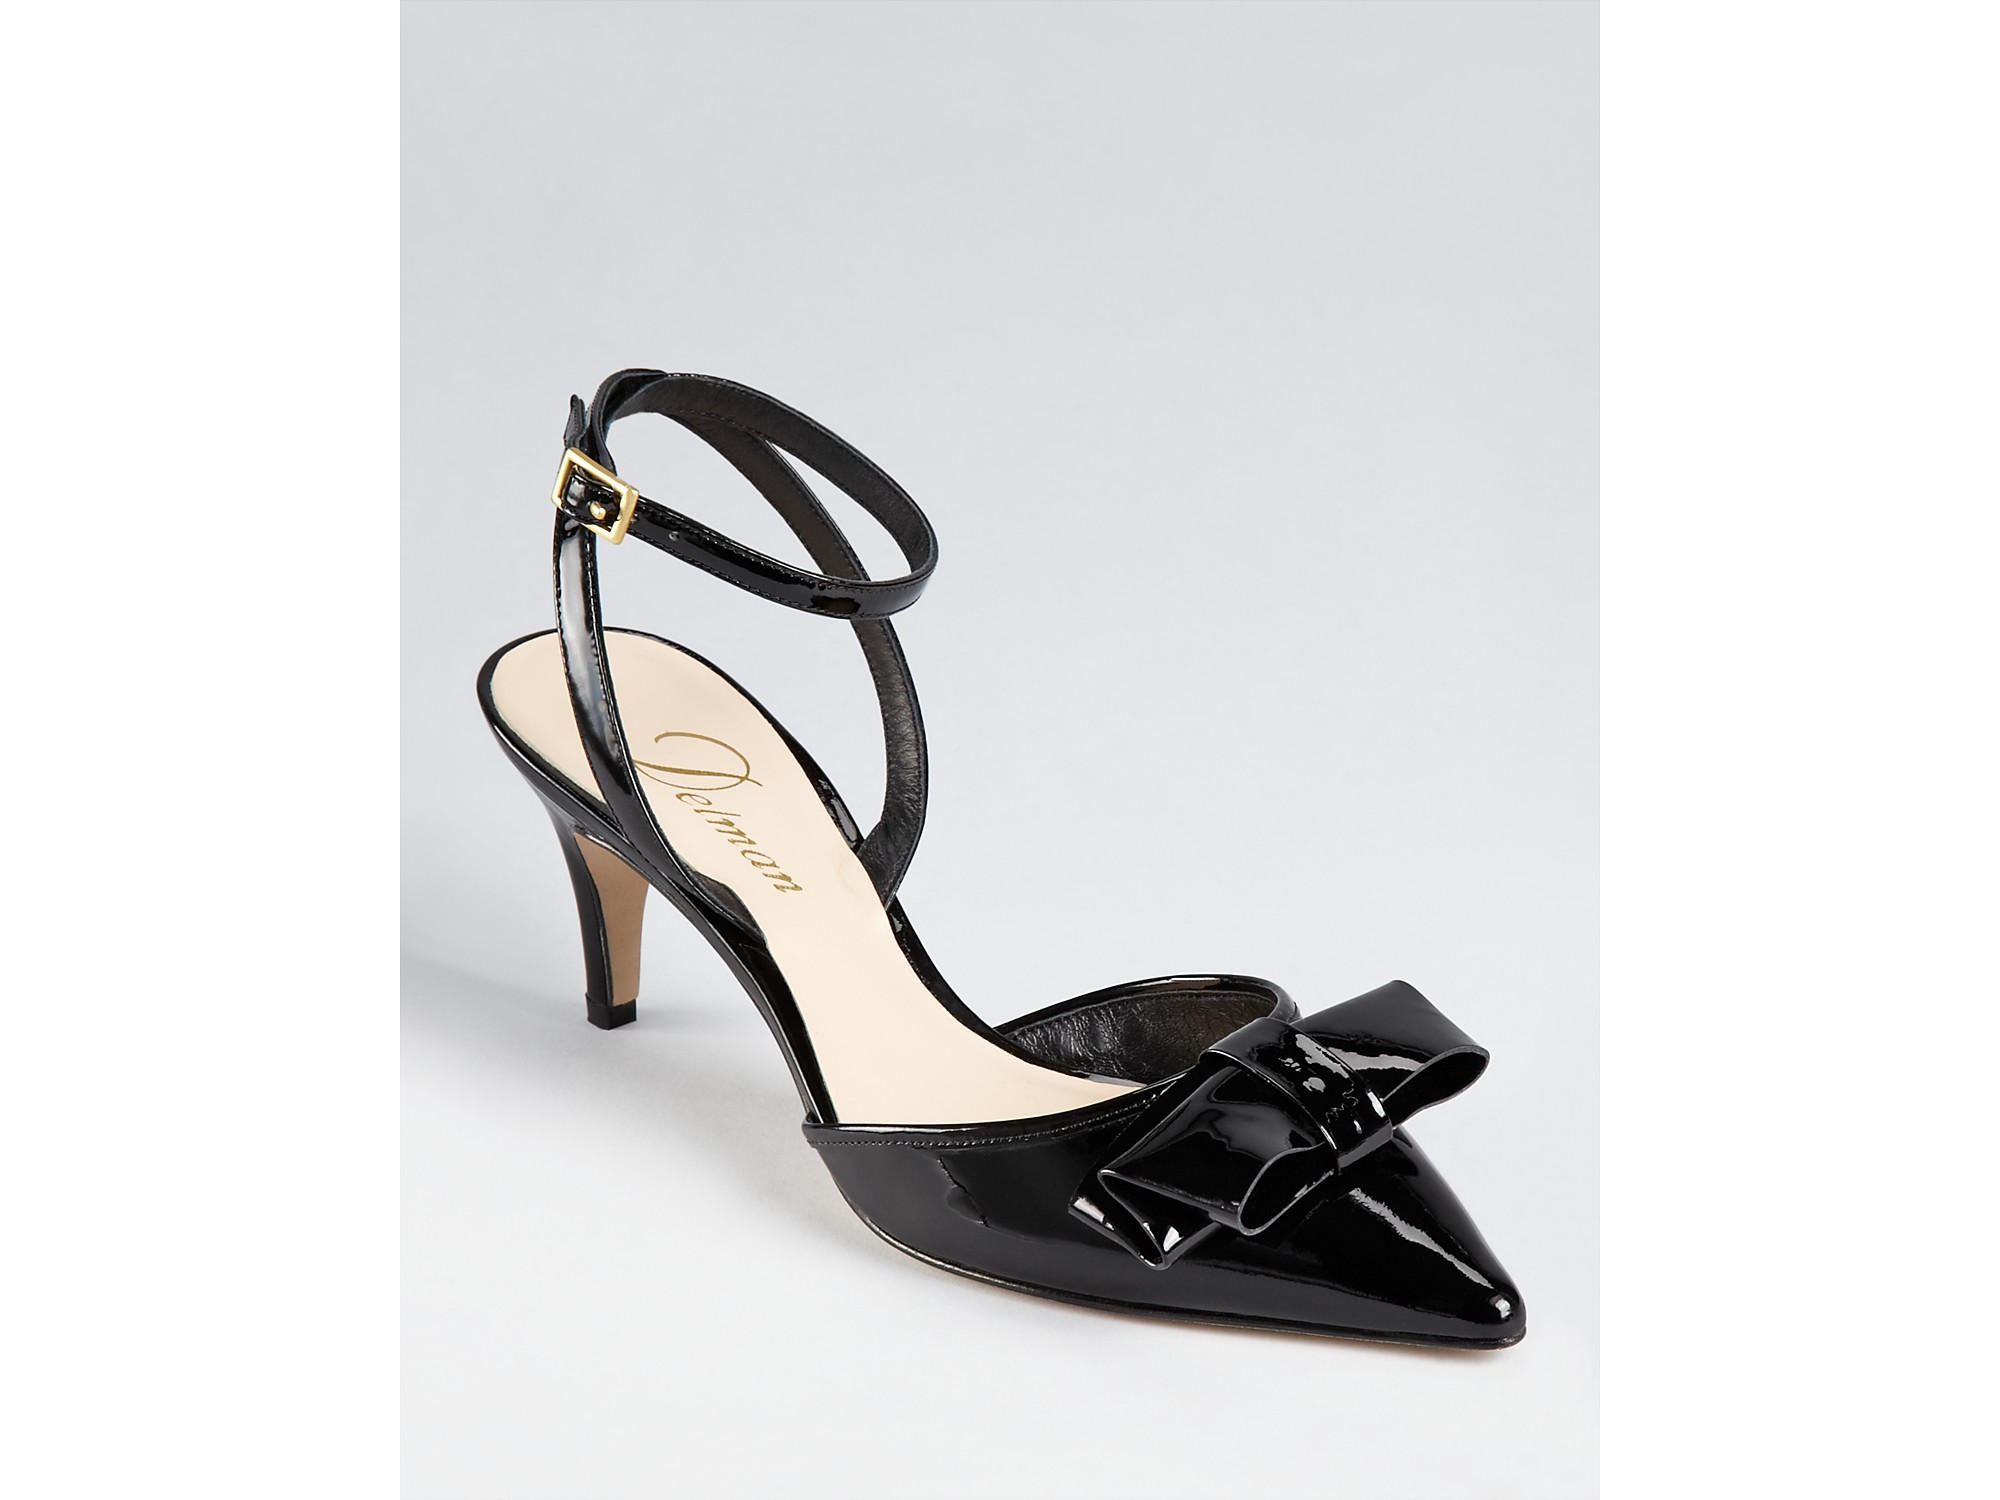 bfac158b16d Lyst - Delman Slingbacks Lyla Kitten Heel in Black